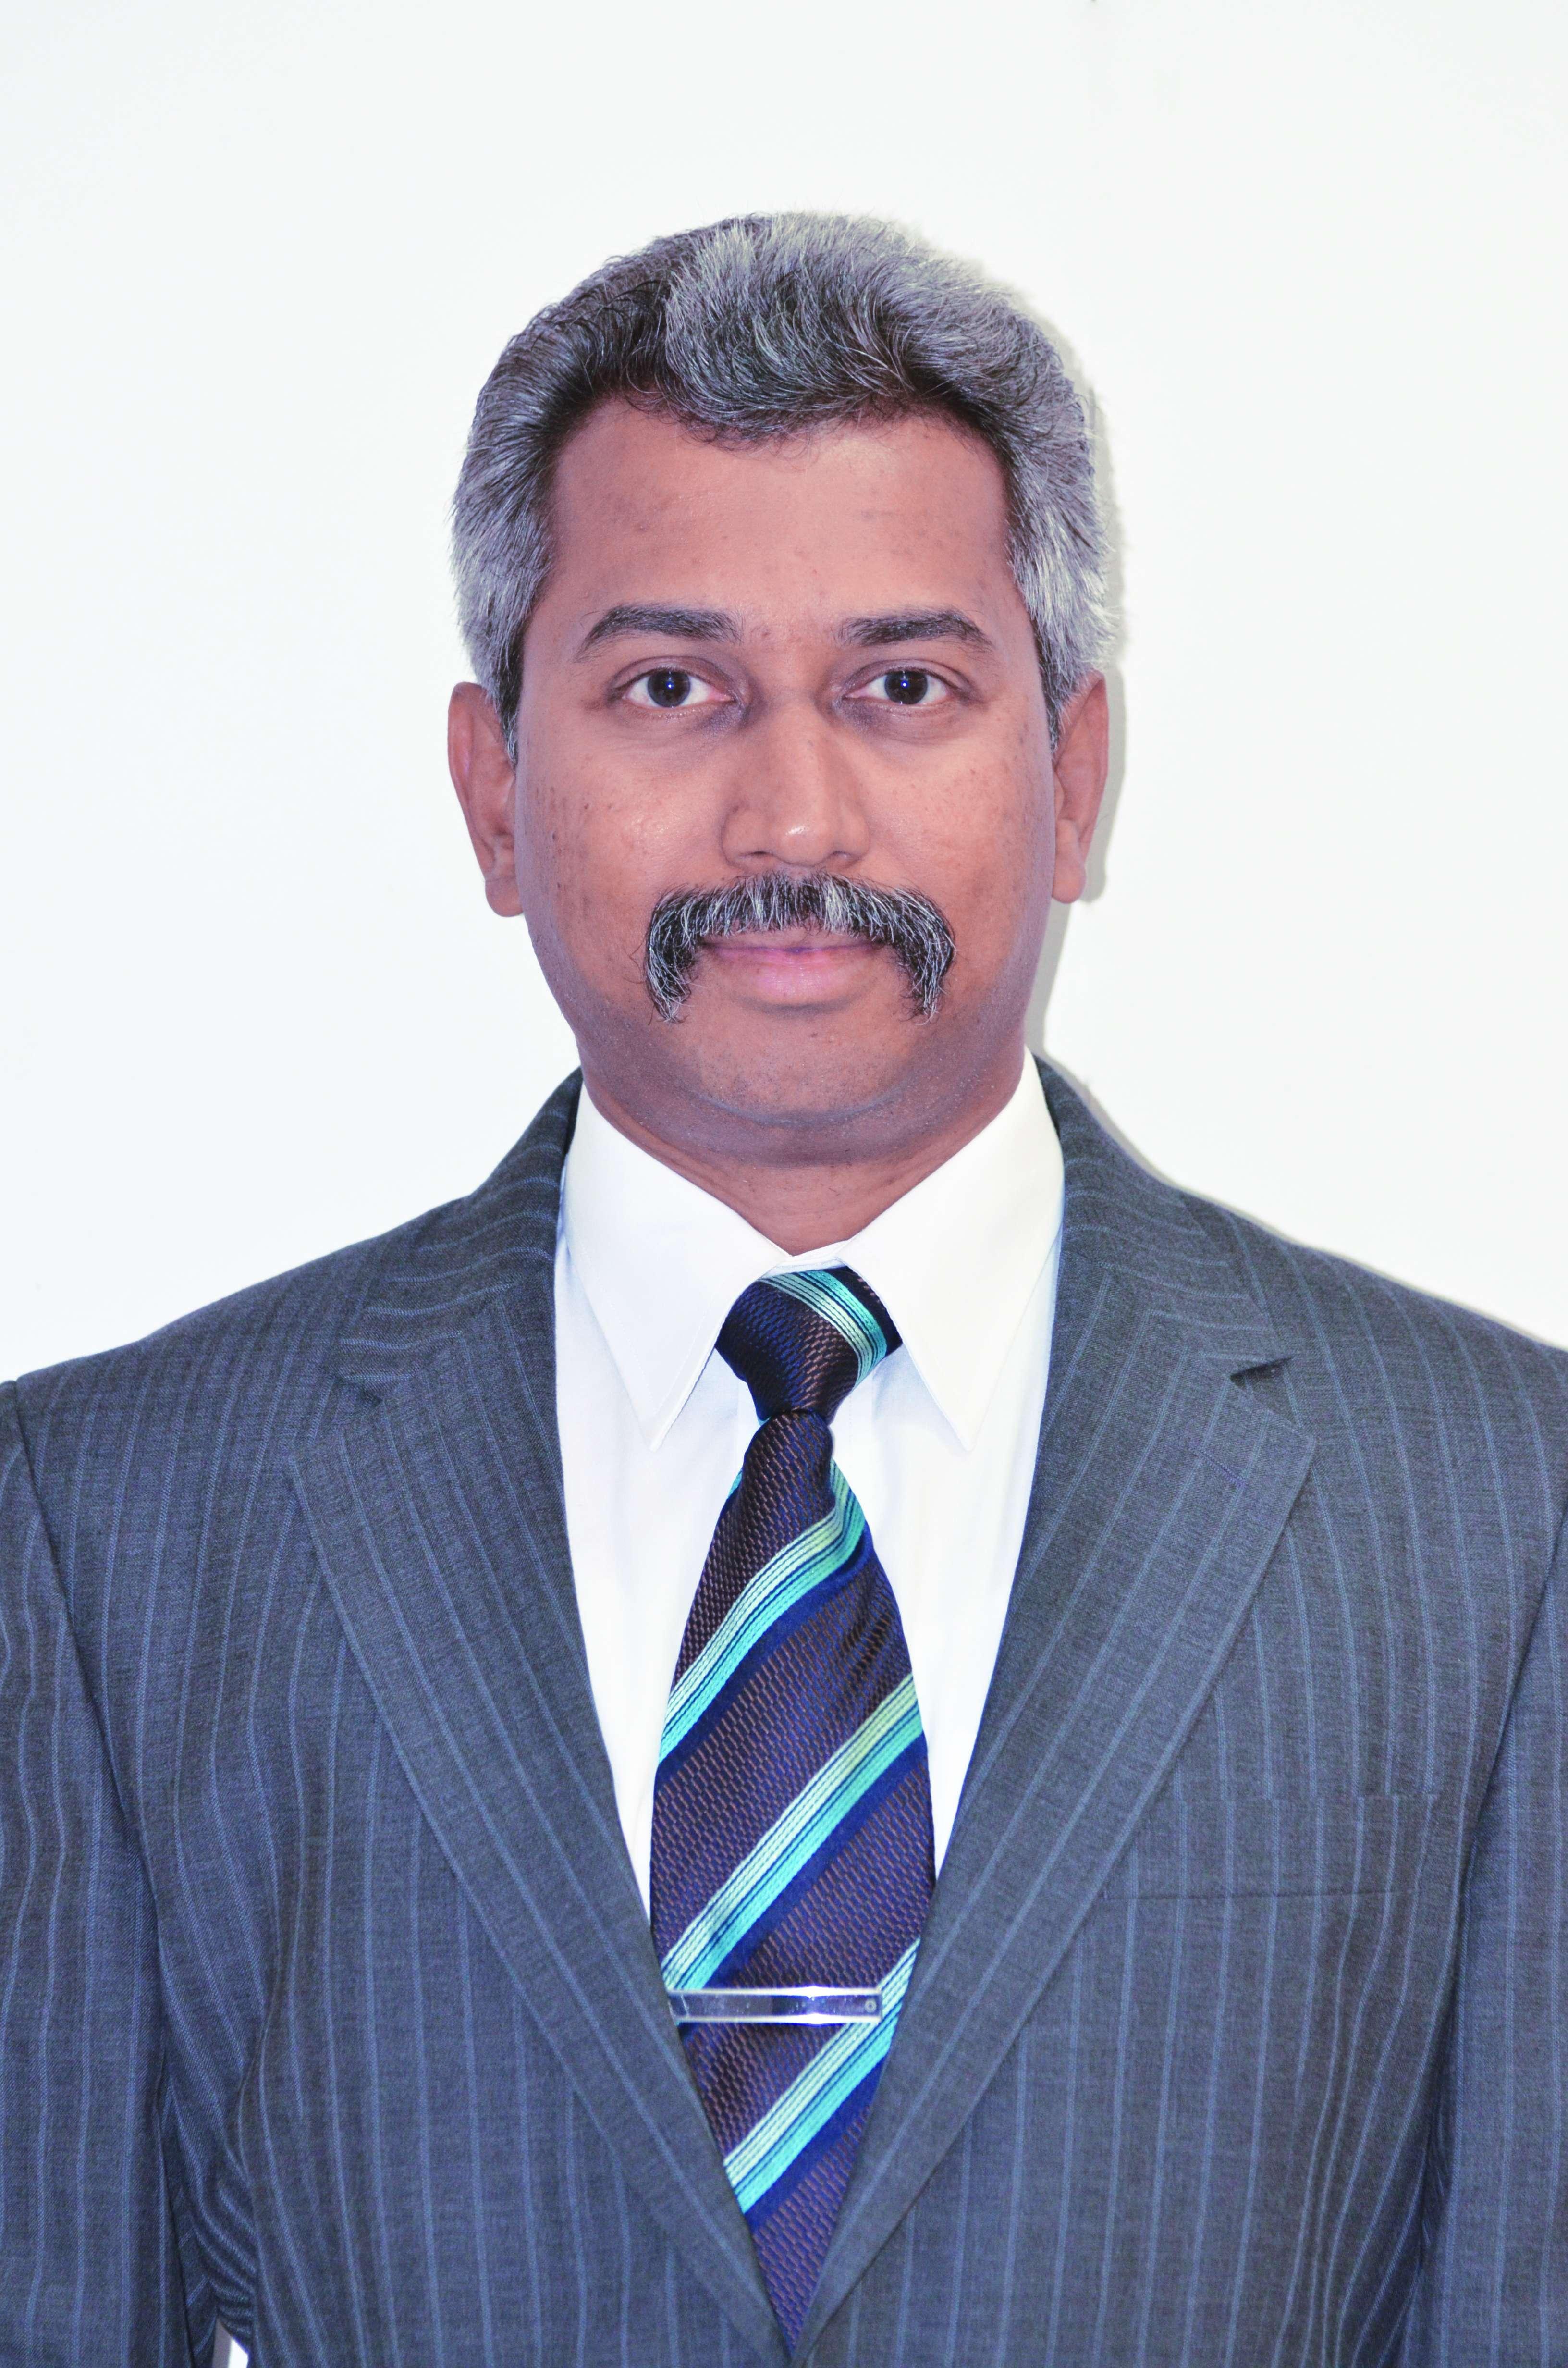 Prashant Sardeshmukh Vice President and Director MMC Hardmetal India Pvt Ltd